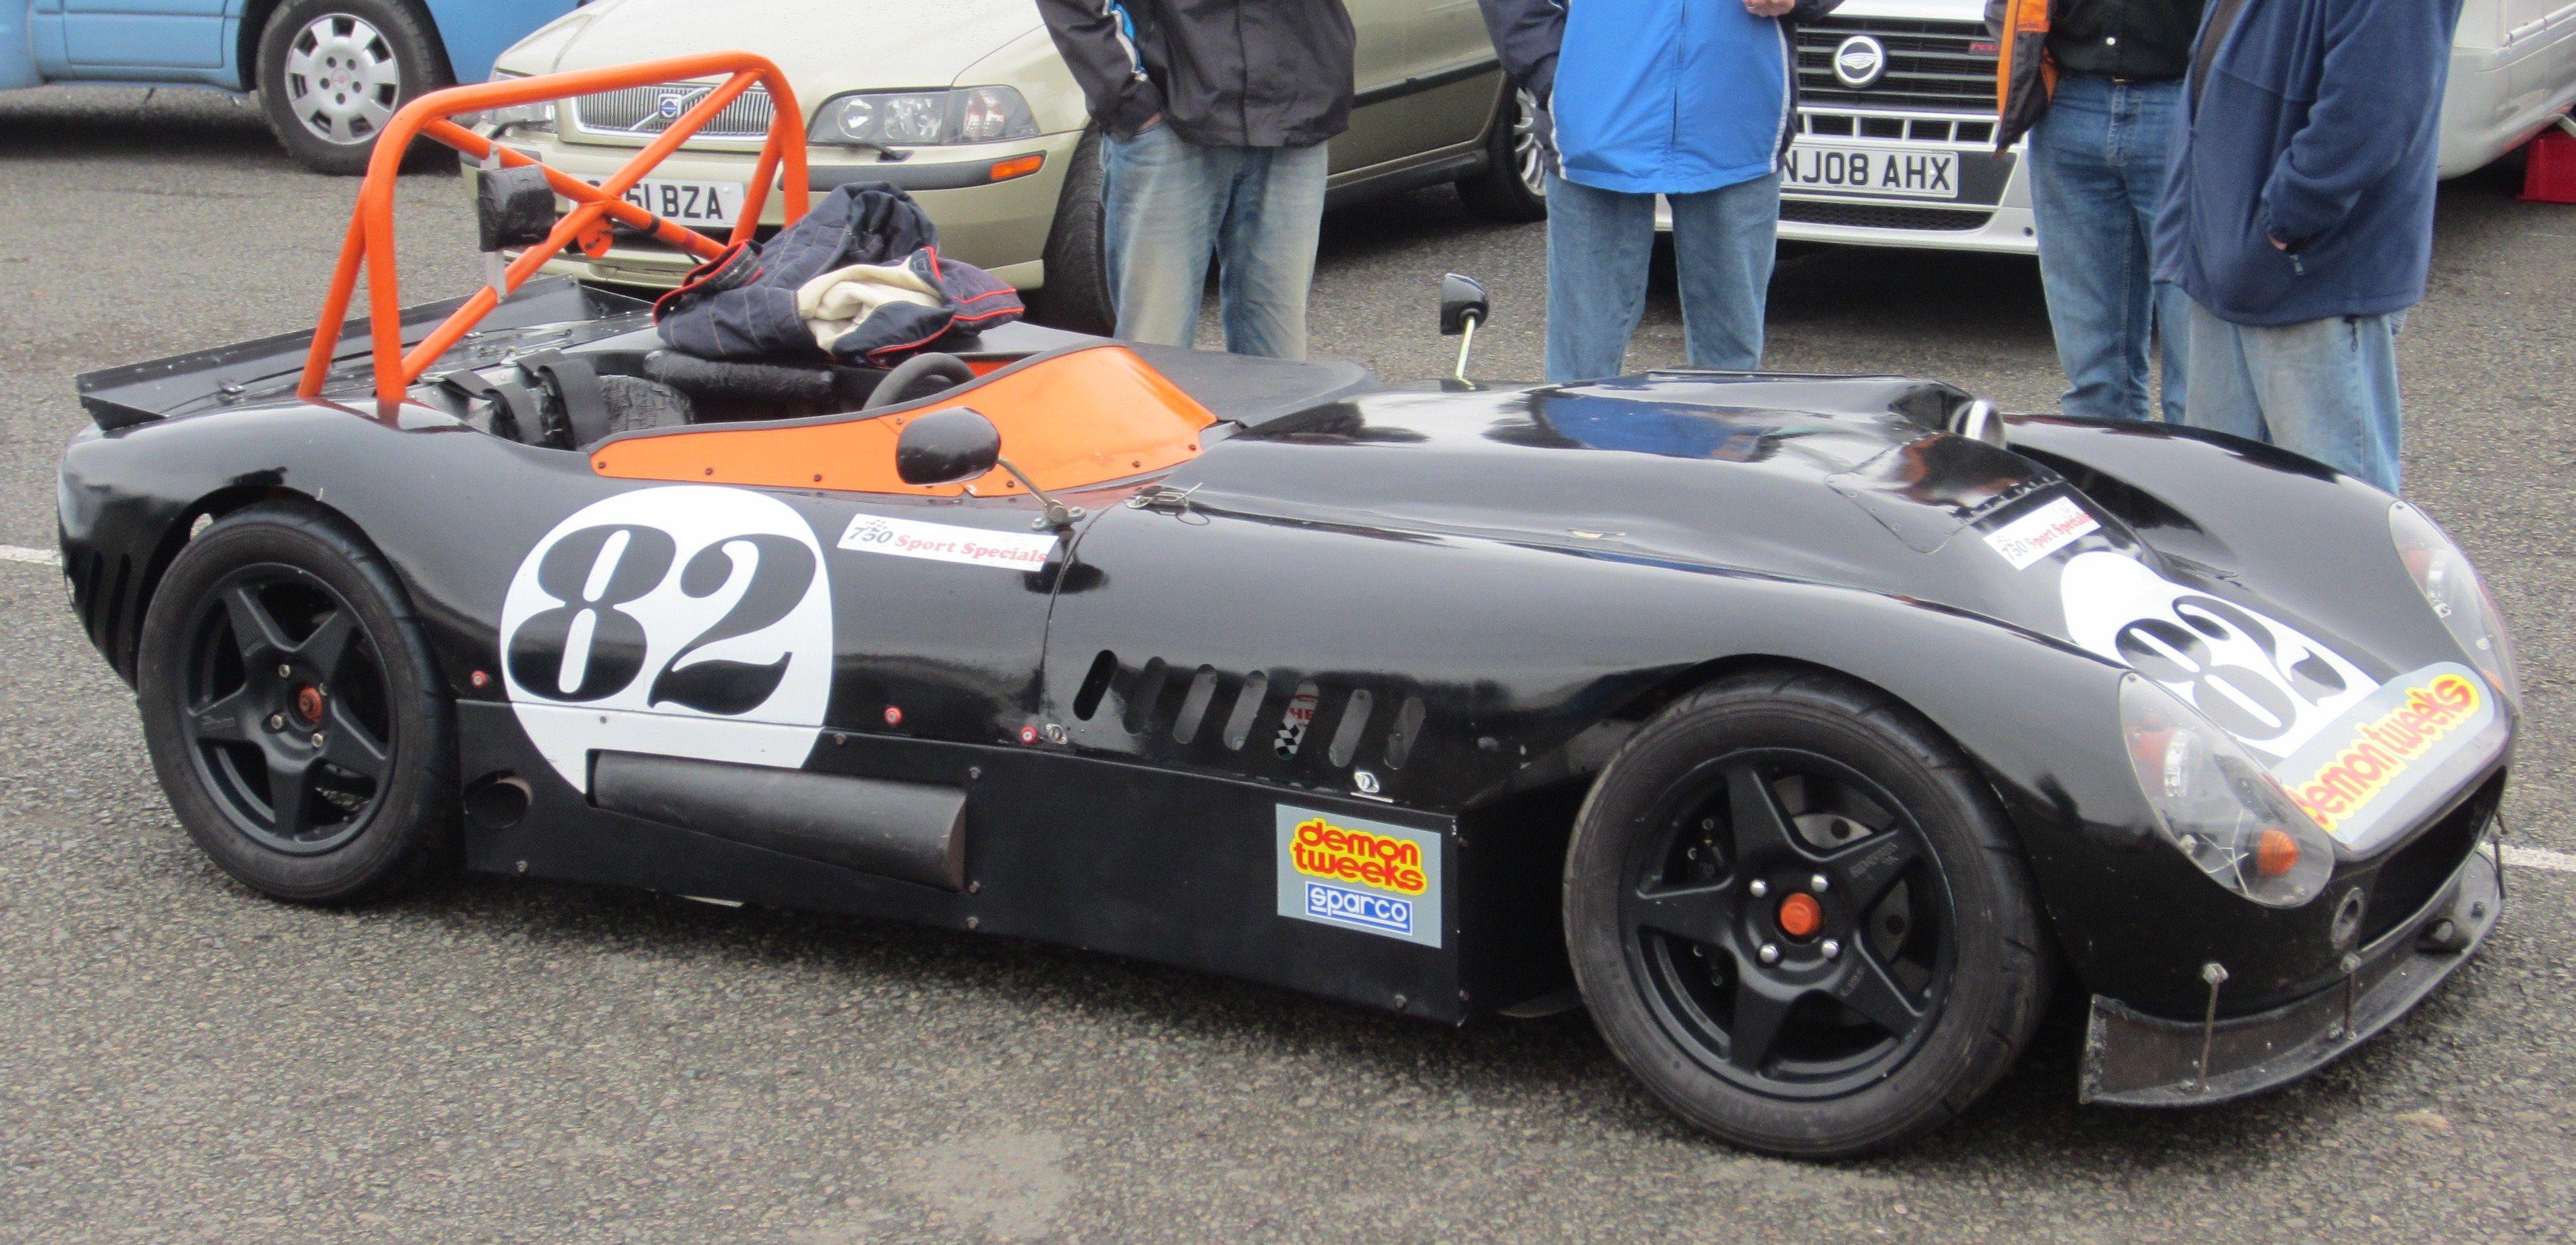 Cyana MX500r (Class A) | Drive | Pinterest | Kit cars, Super car ...